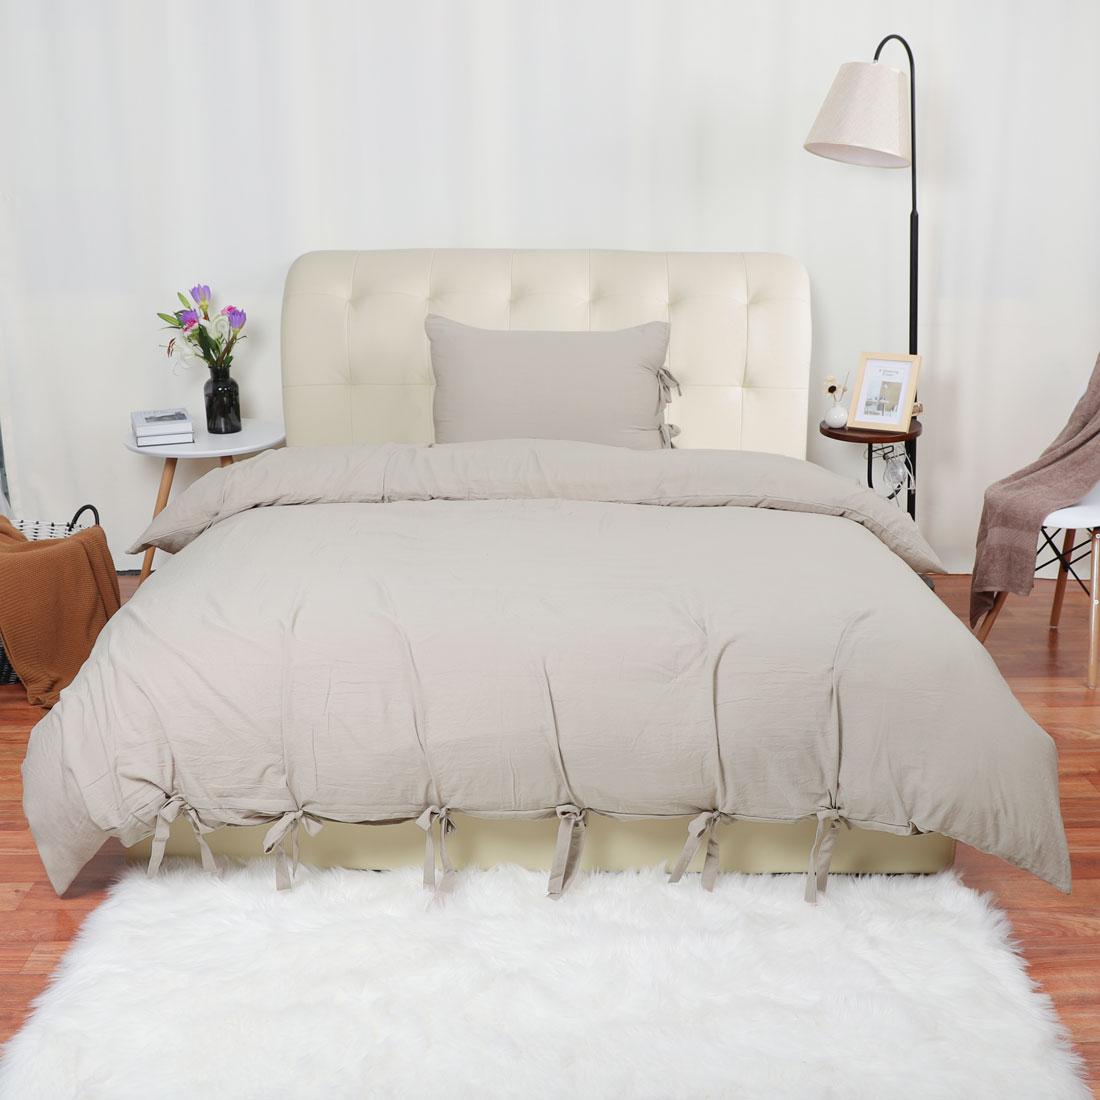 PiccoCasa Washed Cotton Bedding Comforter Duvet Cover Pillowcase Set